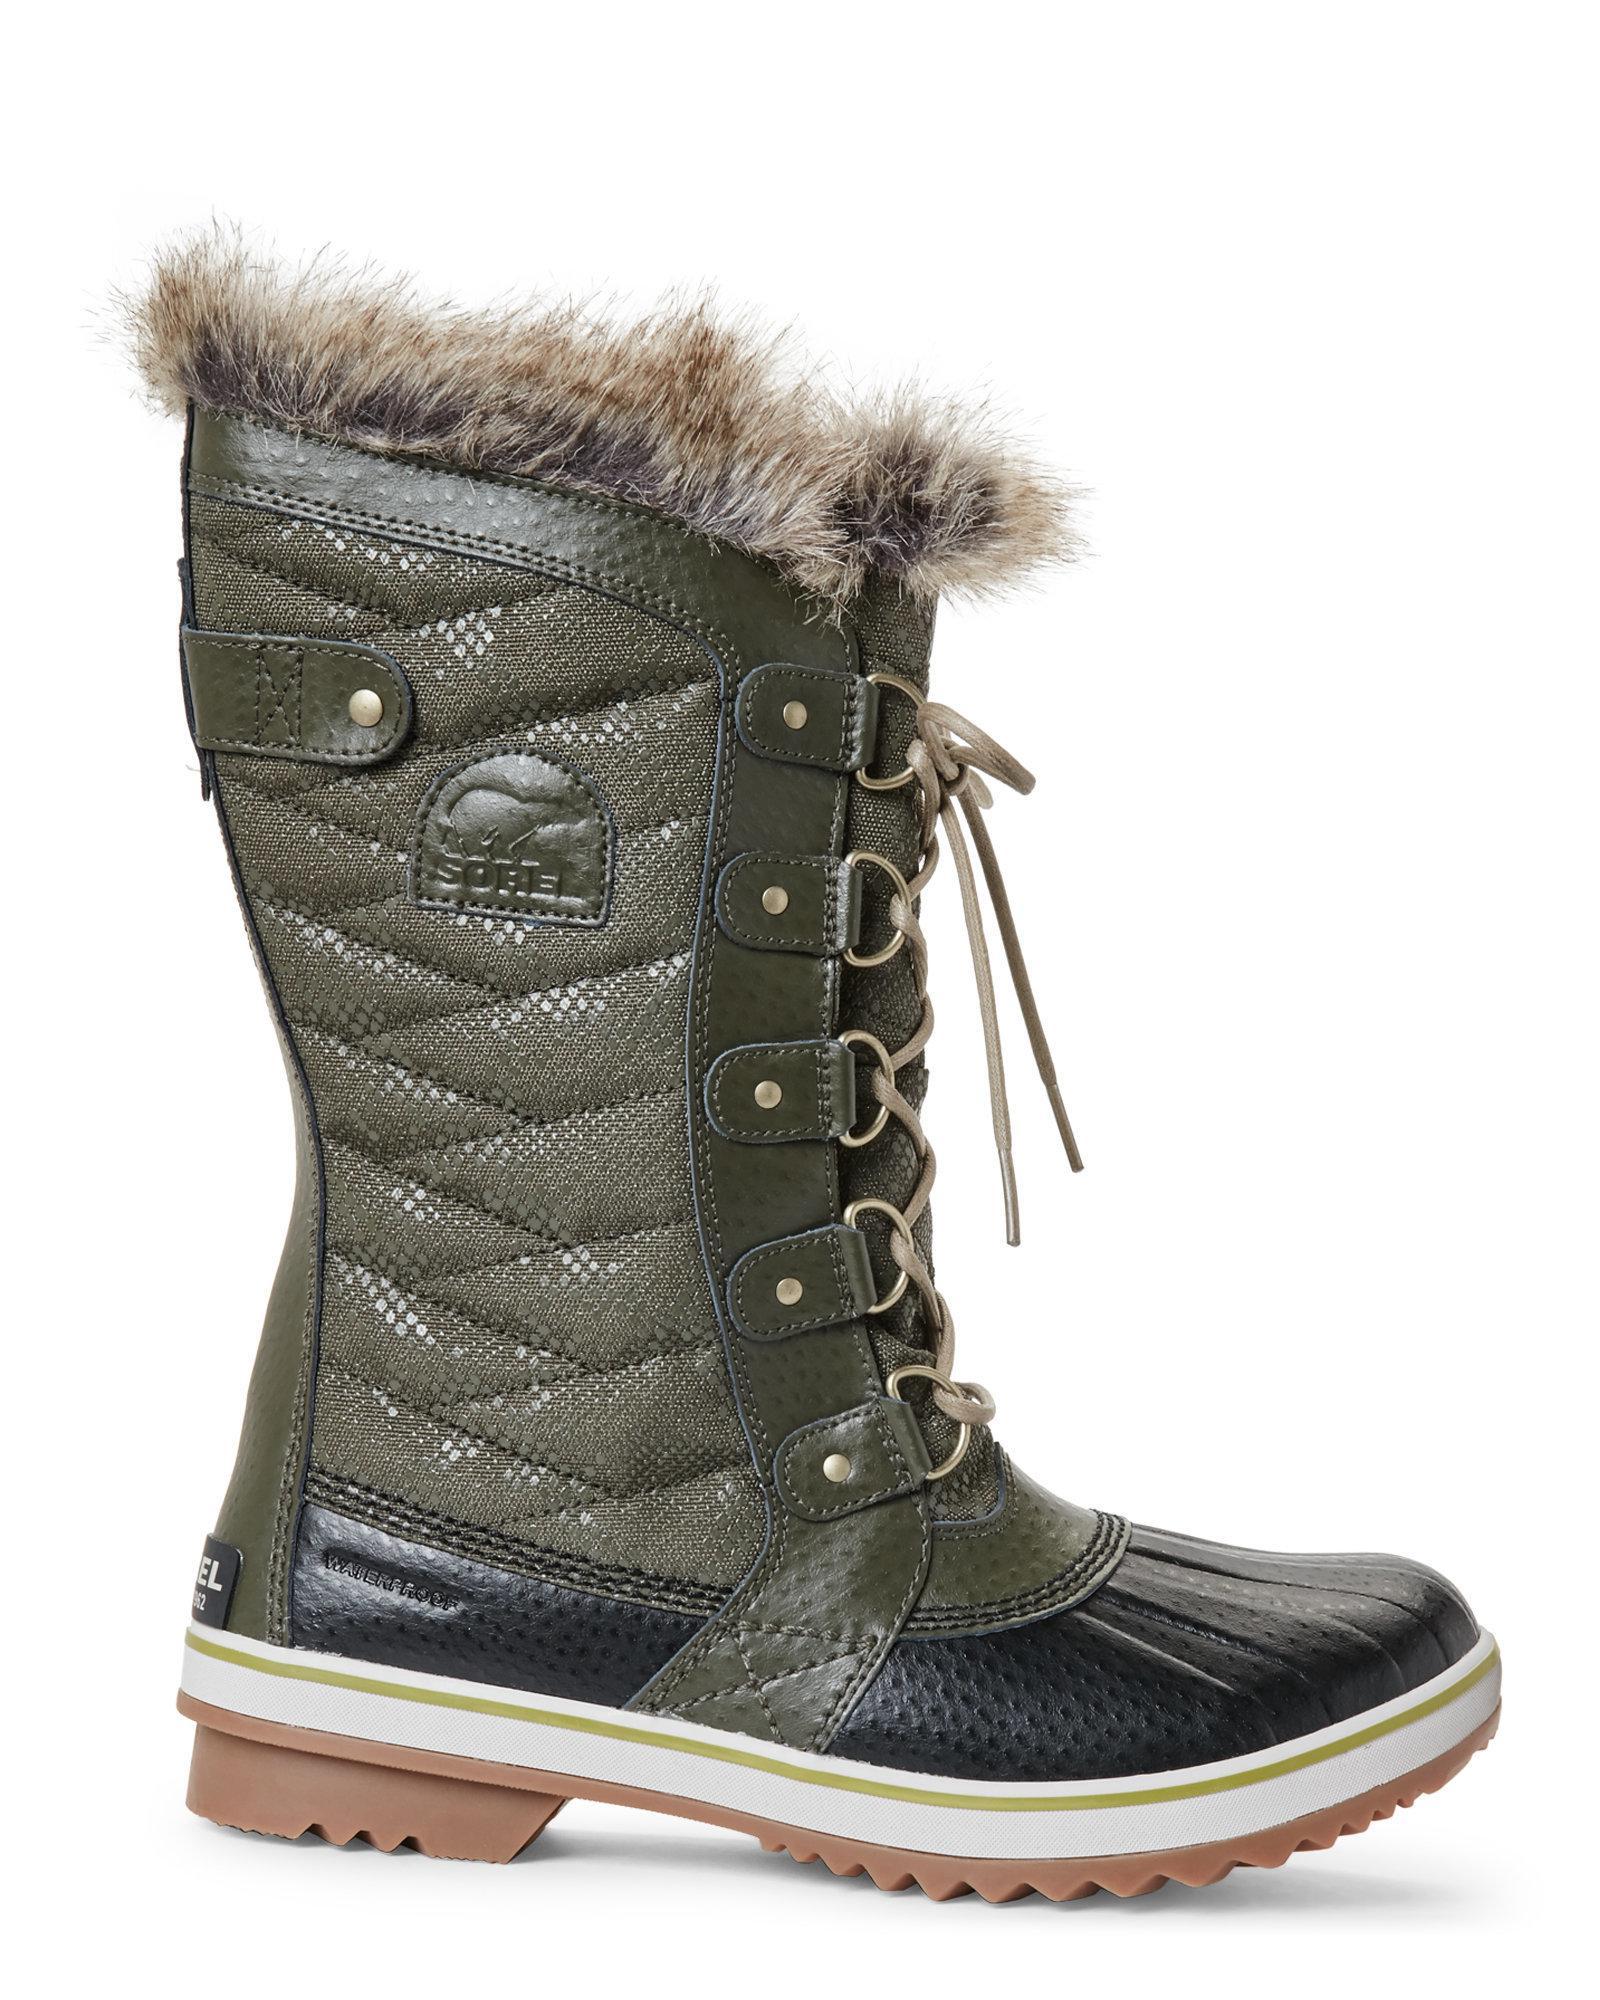 c82ad251d5ad Lyst - Sorel Peatmoss   Black Tofino Ii Winter Boots in Black